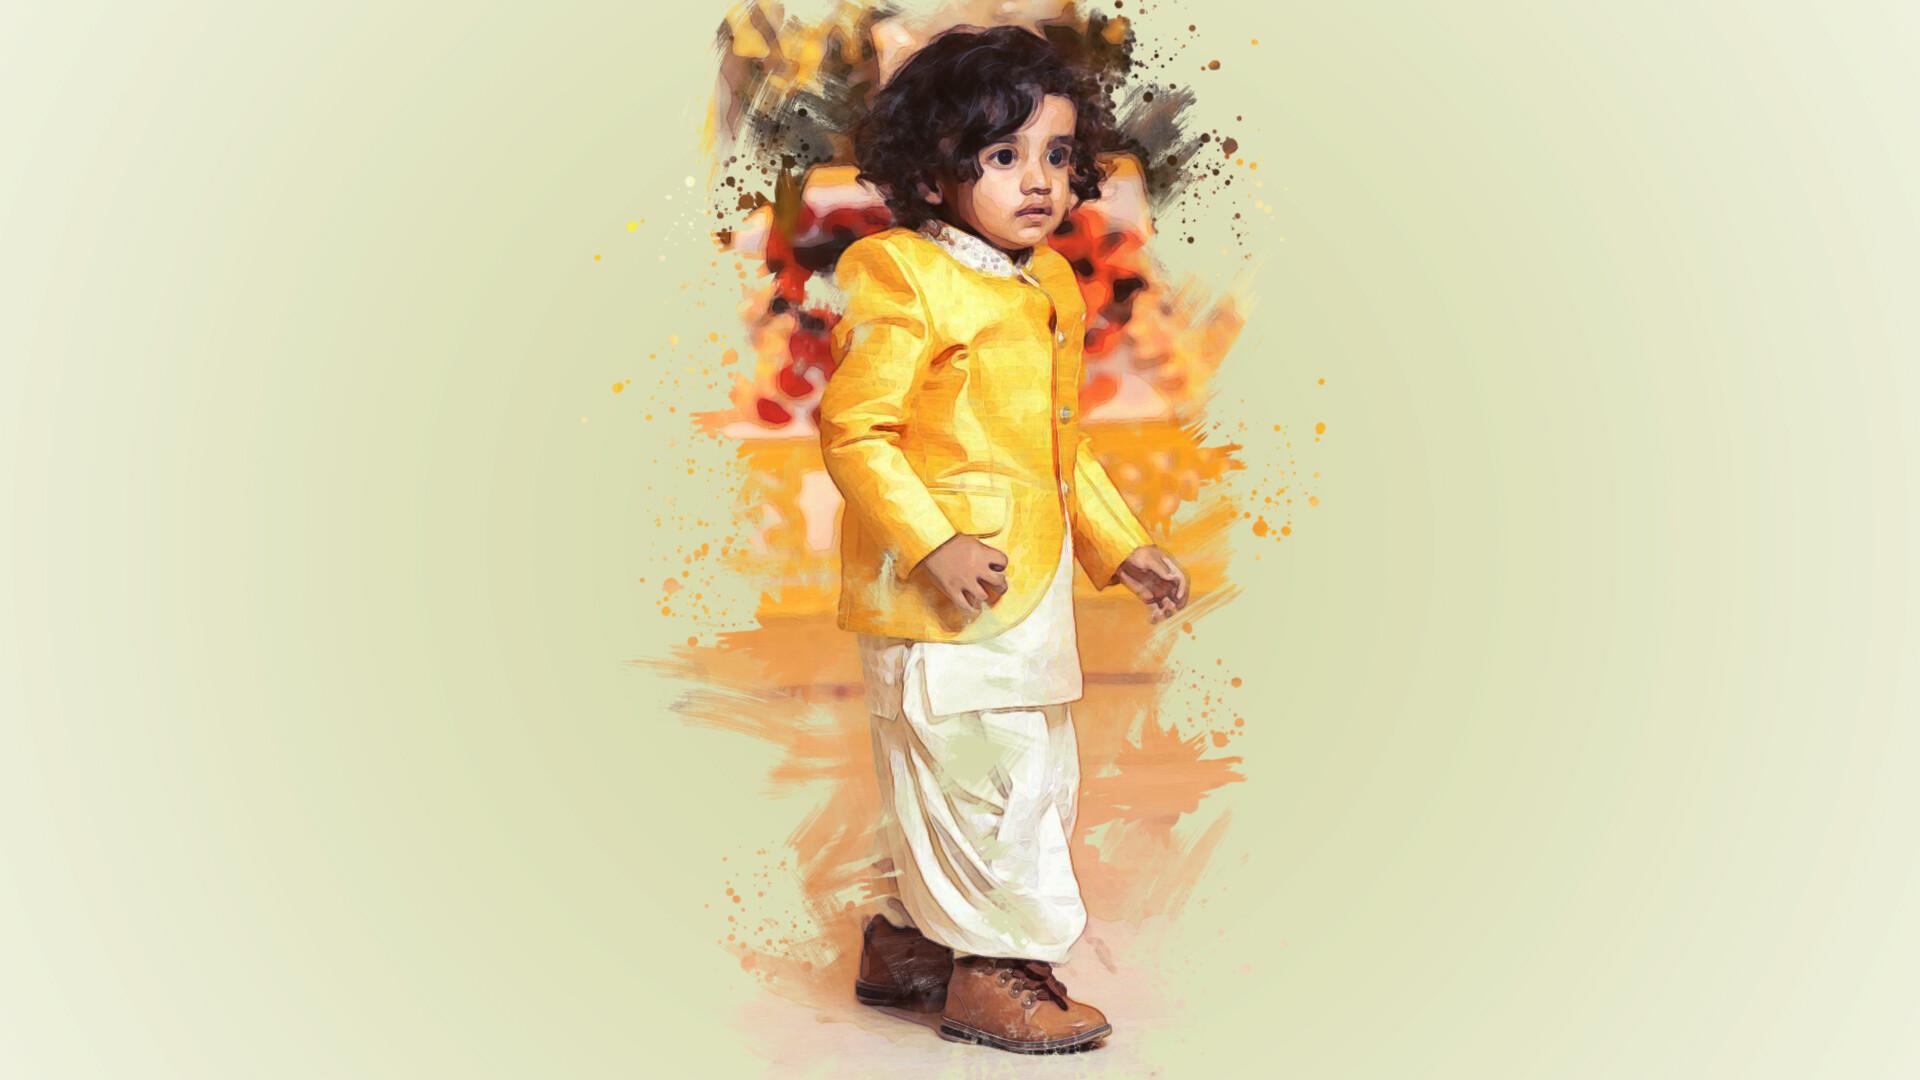 ArtStation - Watercolor effect, Prabhash Kumar